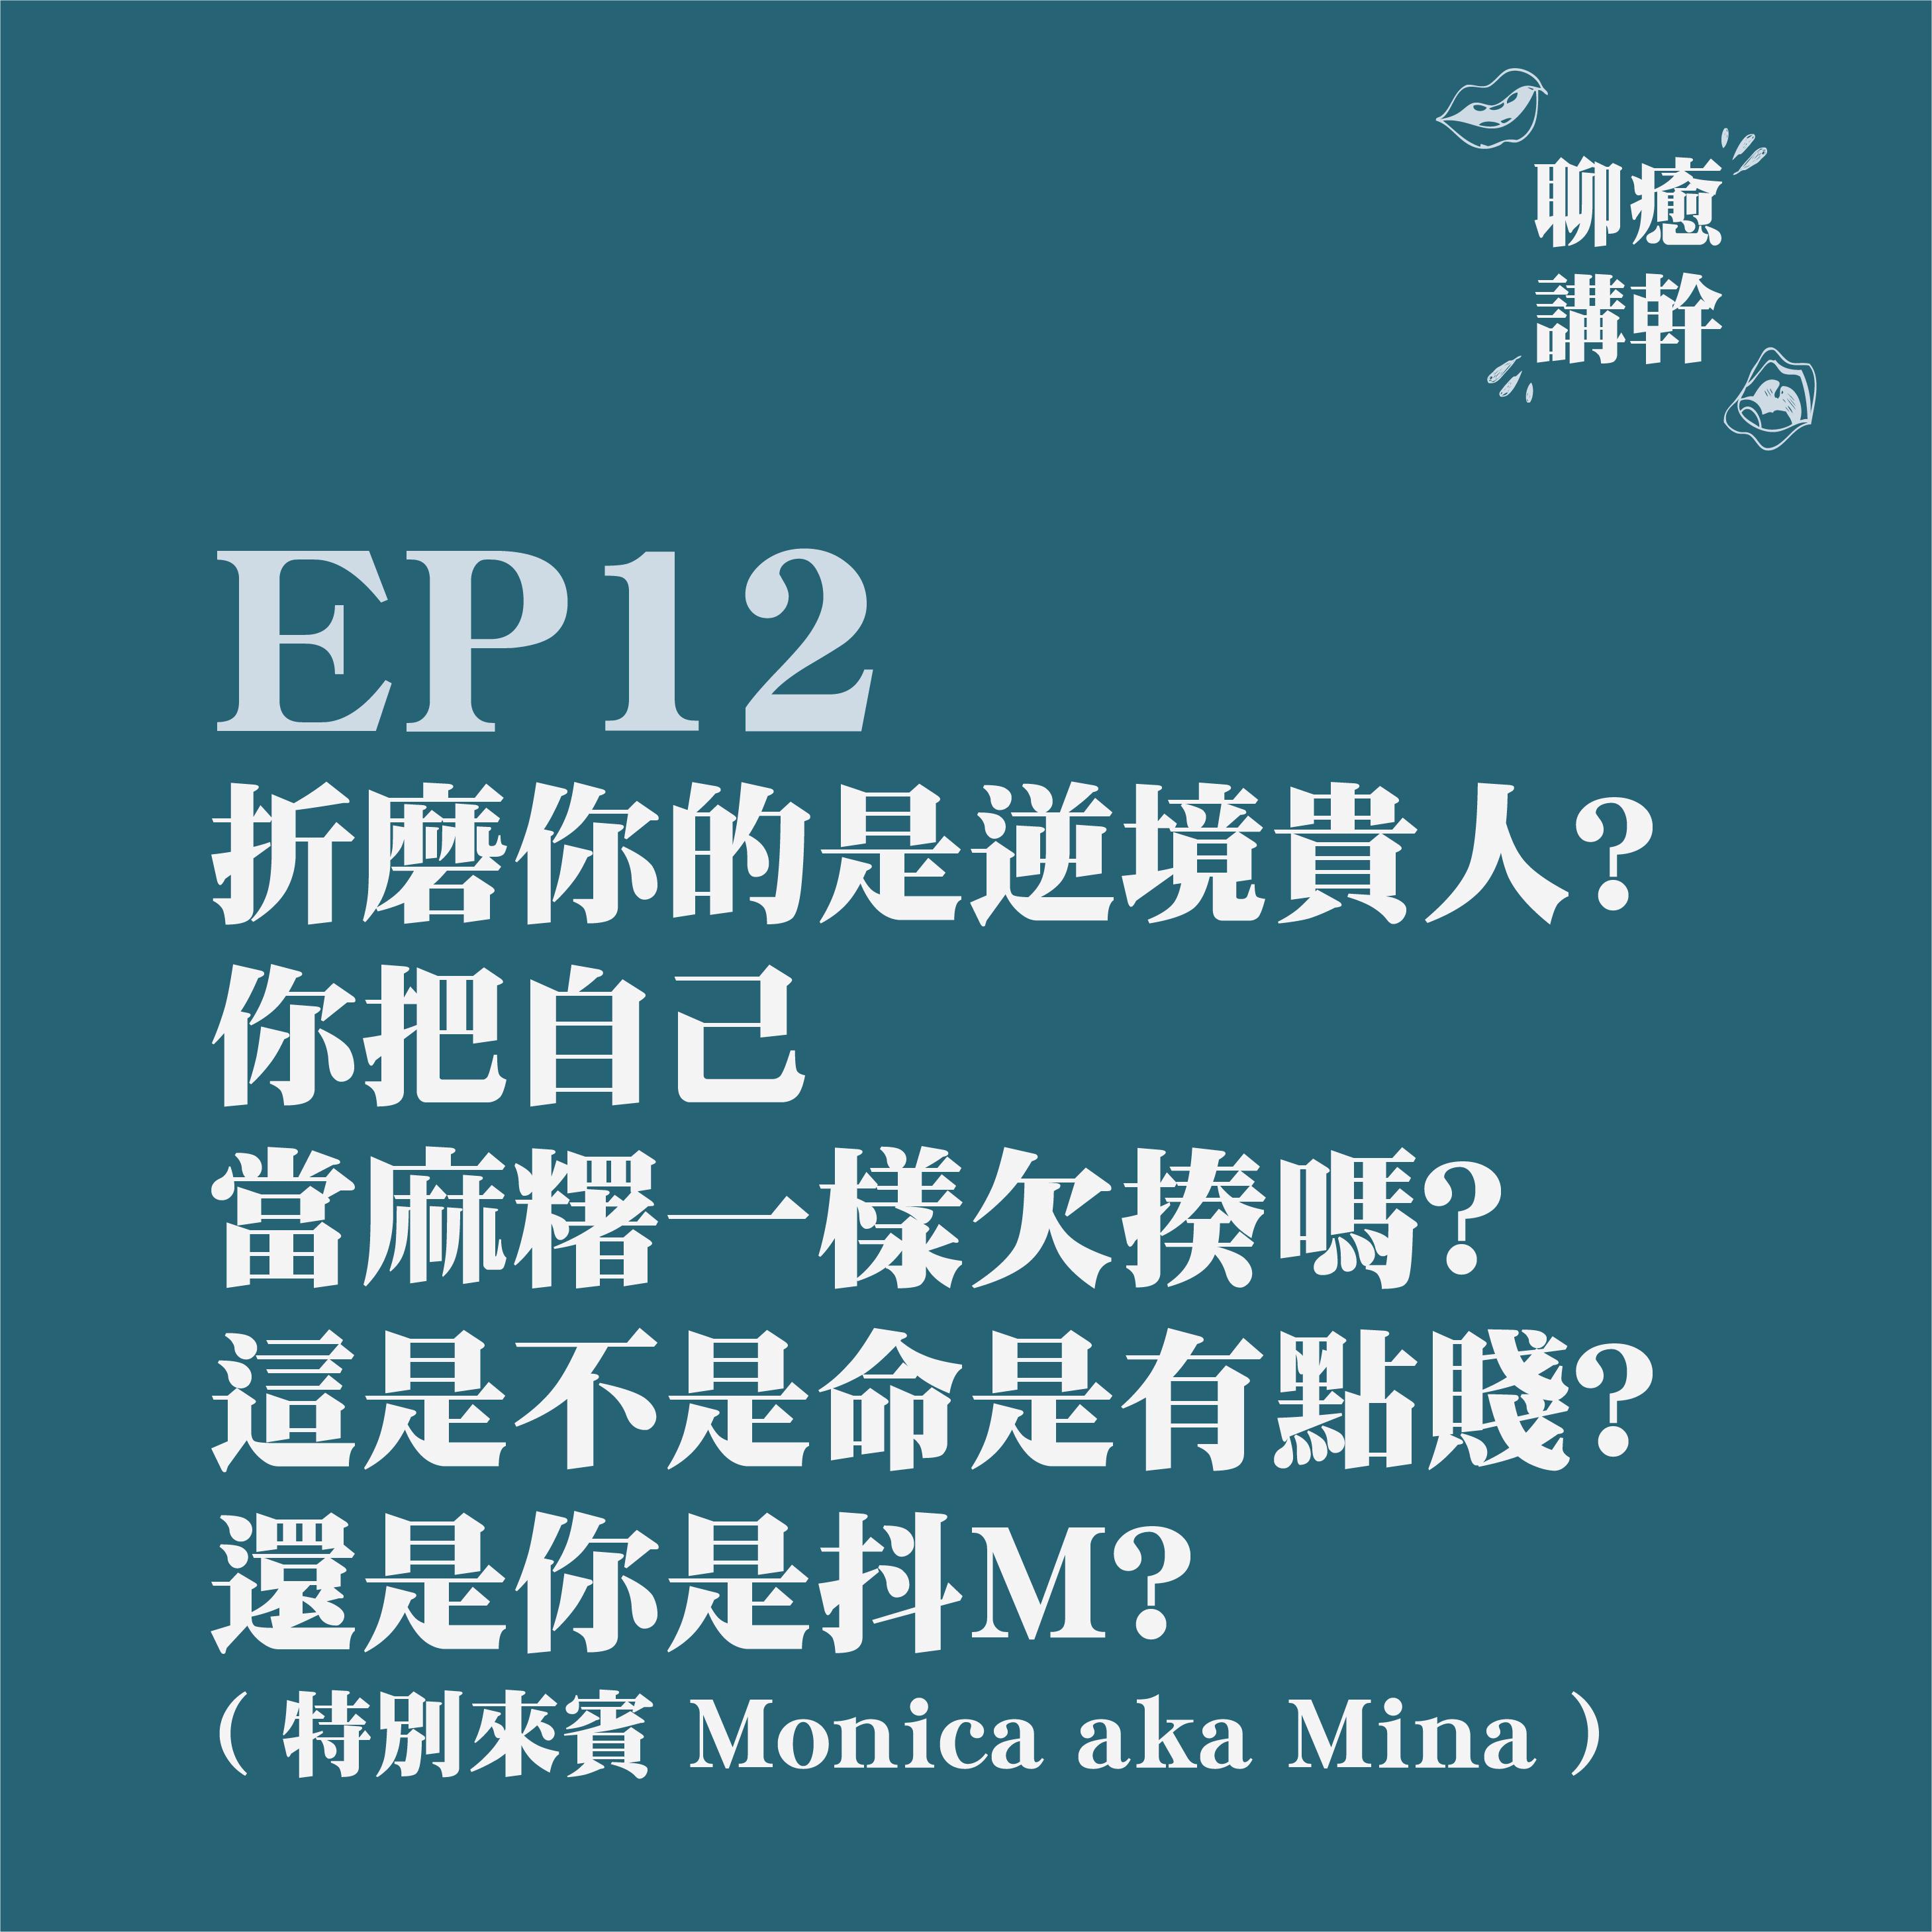 EP12 - 折磨你的是逆境貴人? 你把自己當麻糬一樣欠揍嗎? 這是不是命是有點賤? 還是你是抖M ? feat. Monica aka Mina